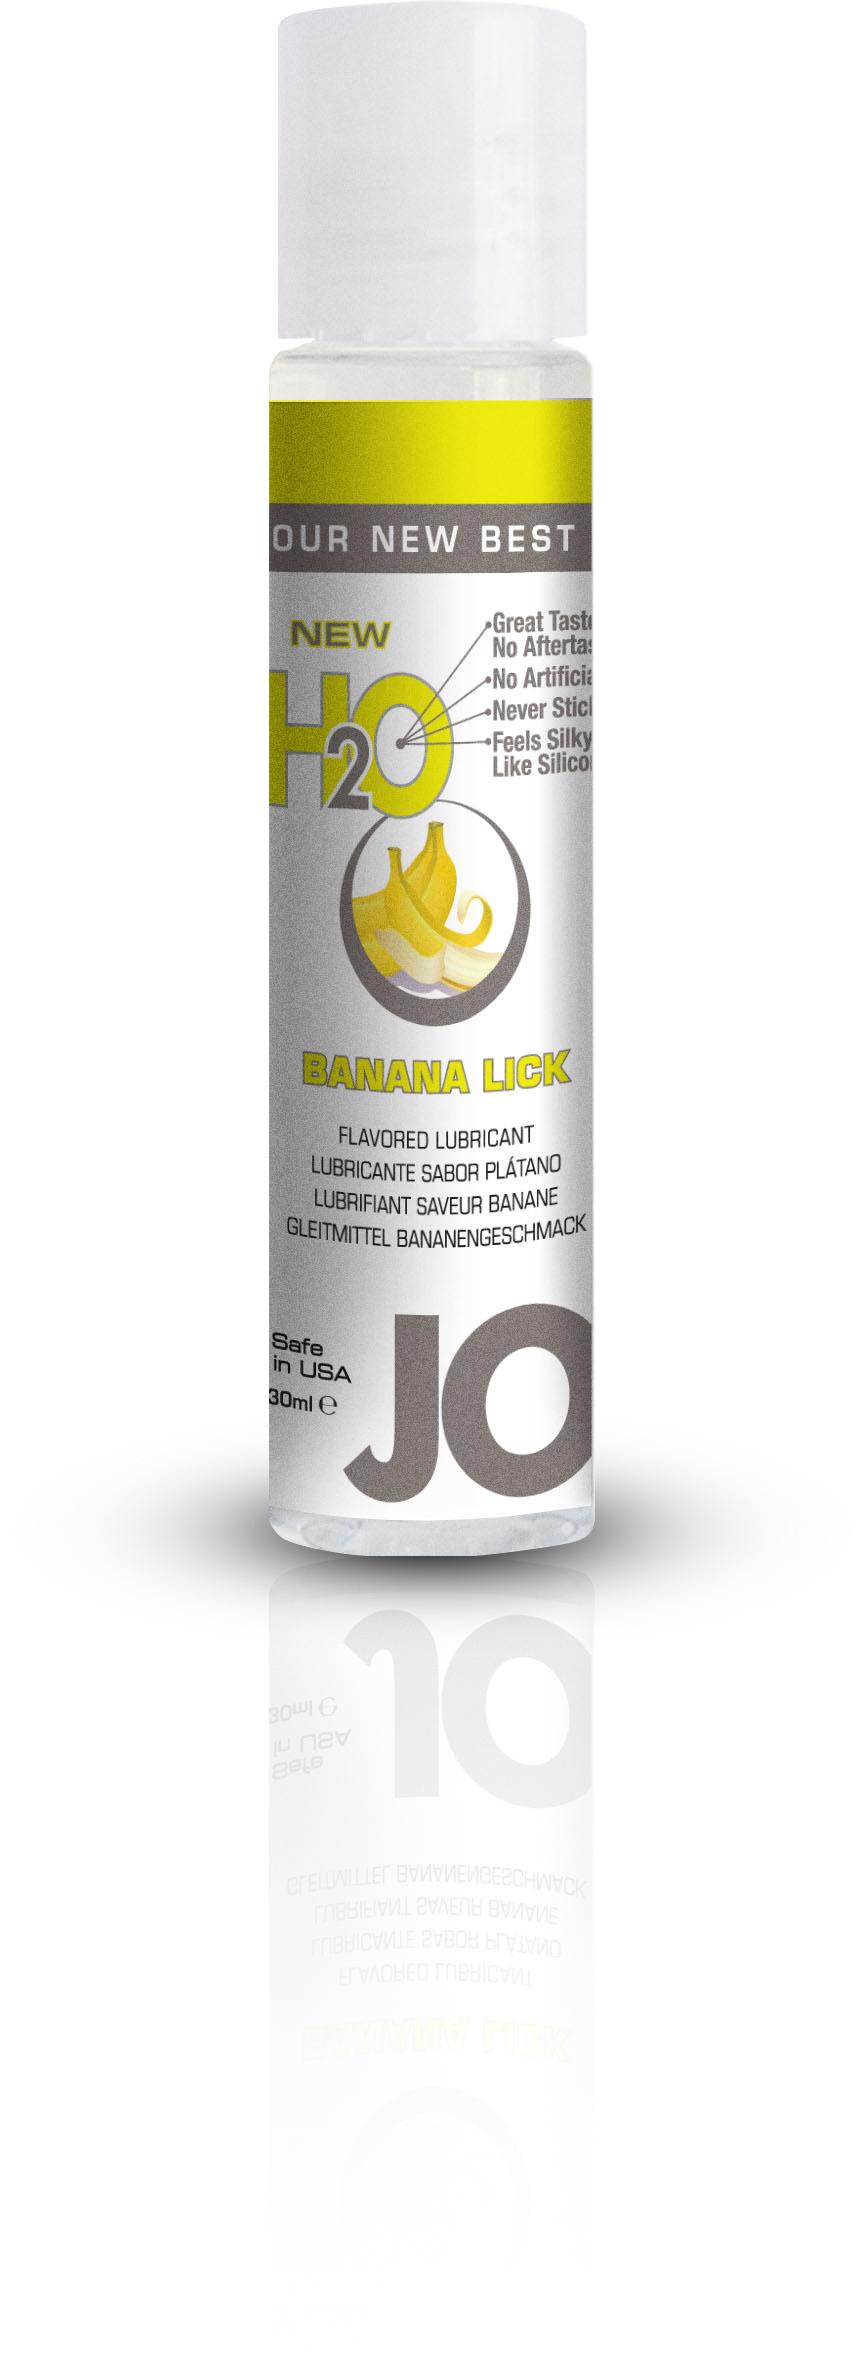 30123_JO_h2o_flavored_lubricant_1oz_1oz_banana.jpg